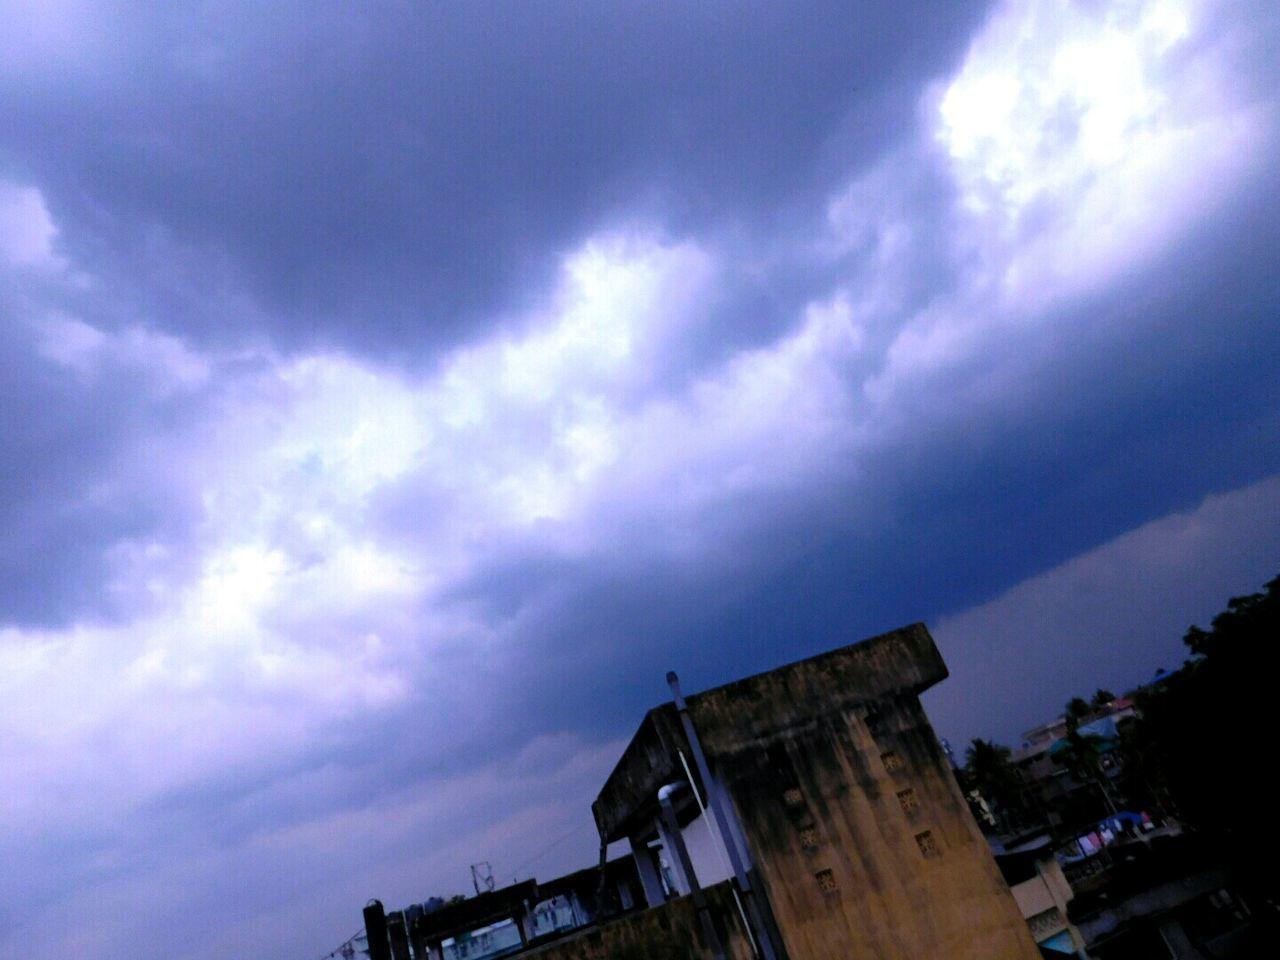 Sky Storm Cloud Cloud - Sky Dramatic Sky No People Thunderstorm Nature Weather Photography